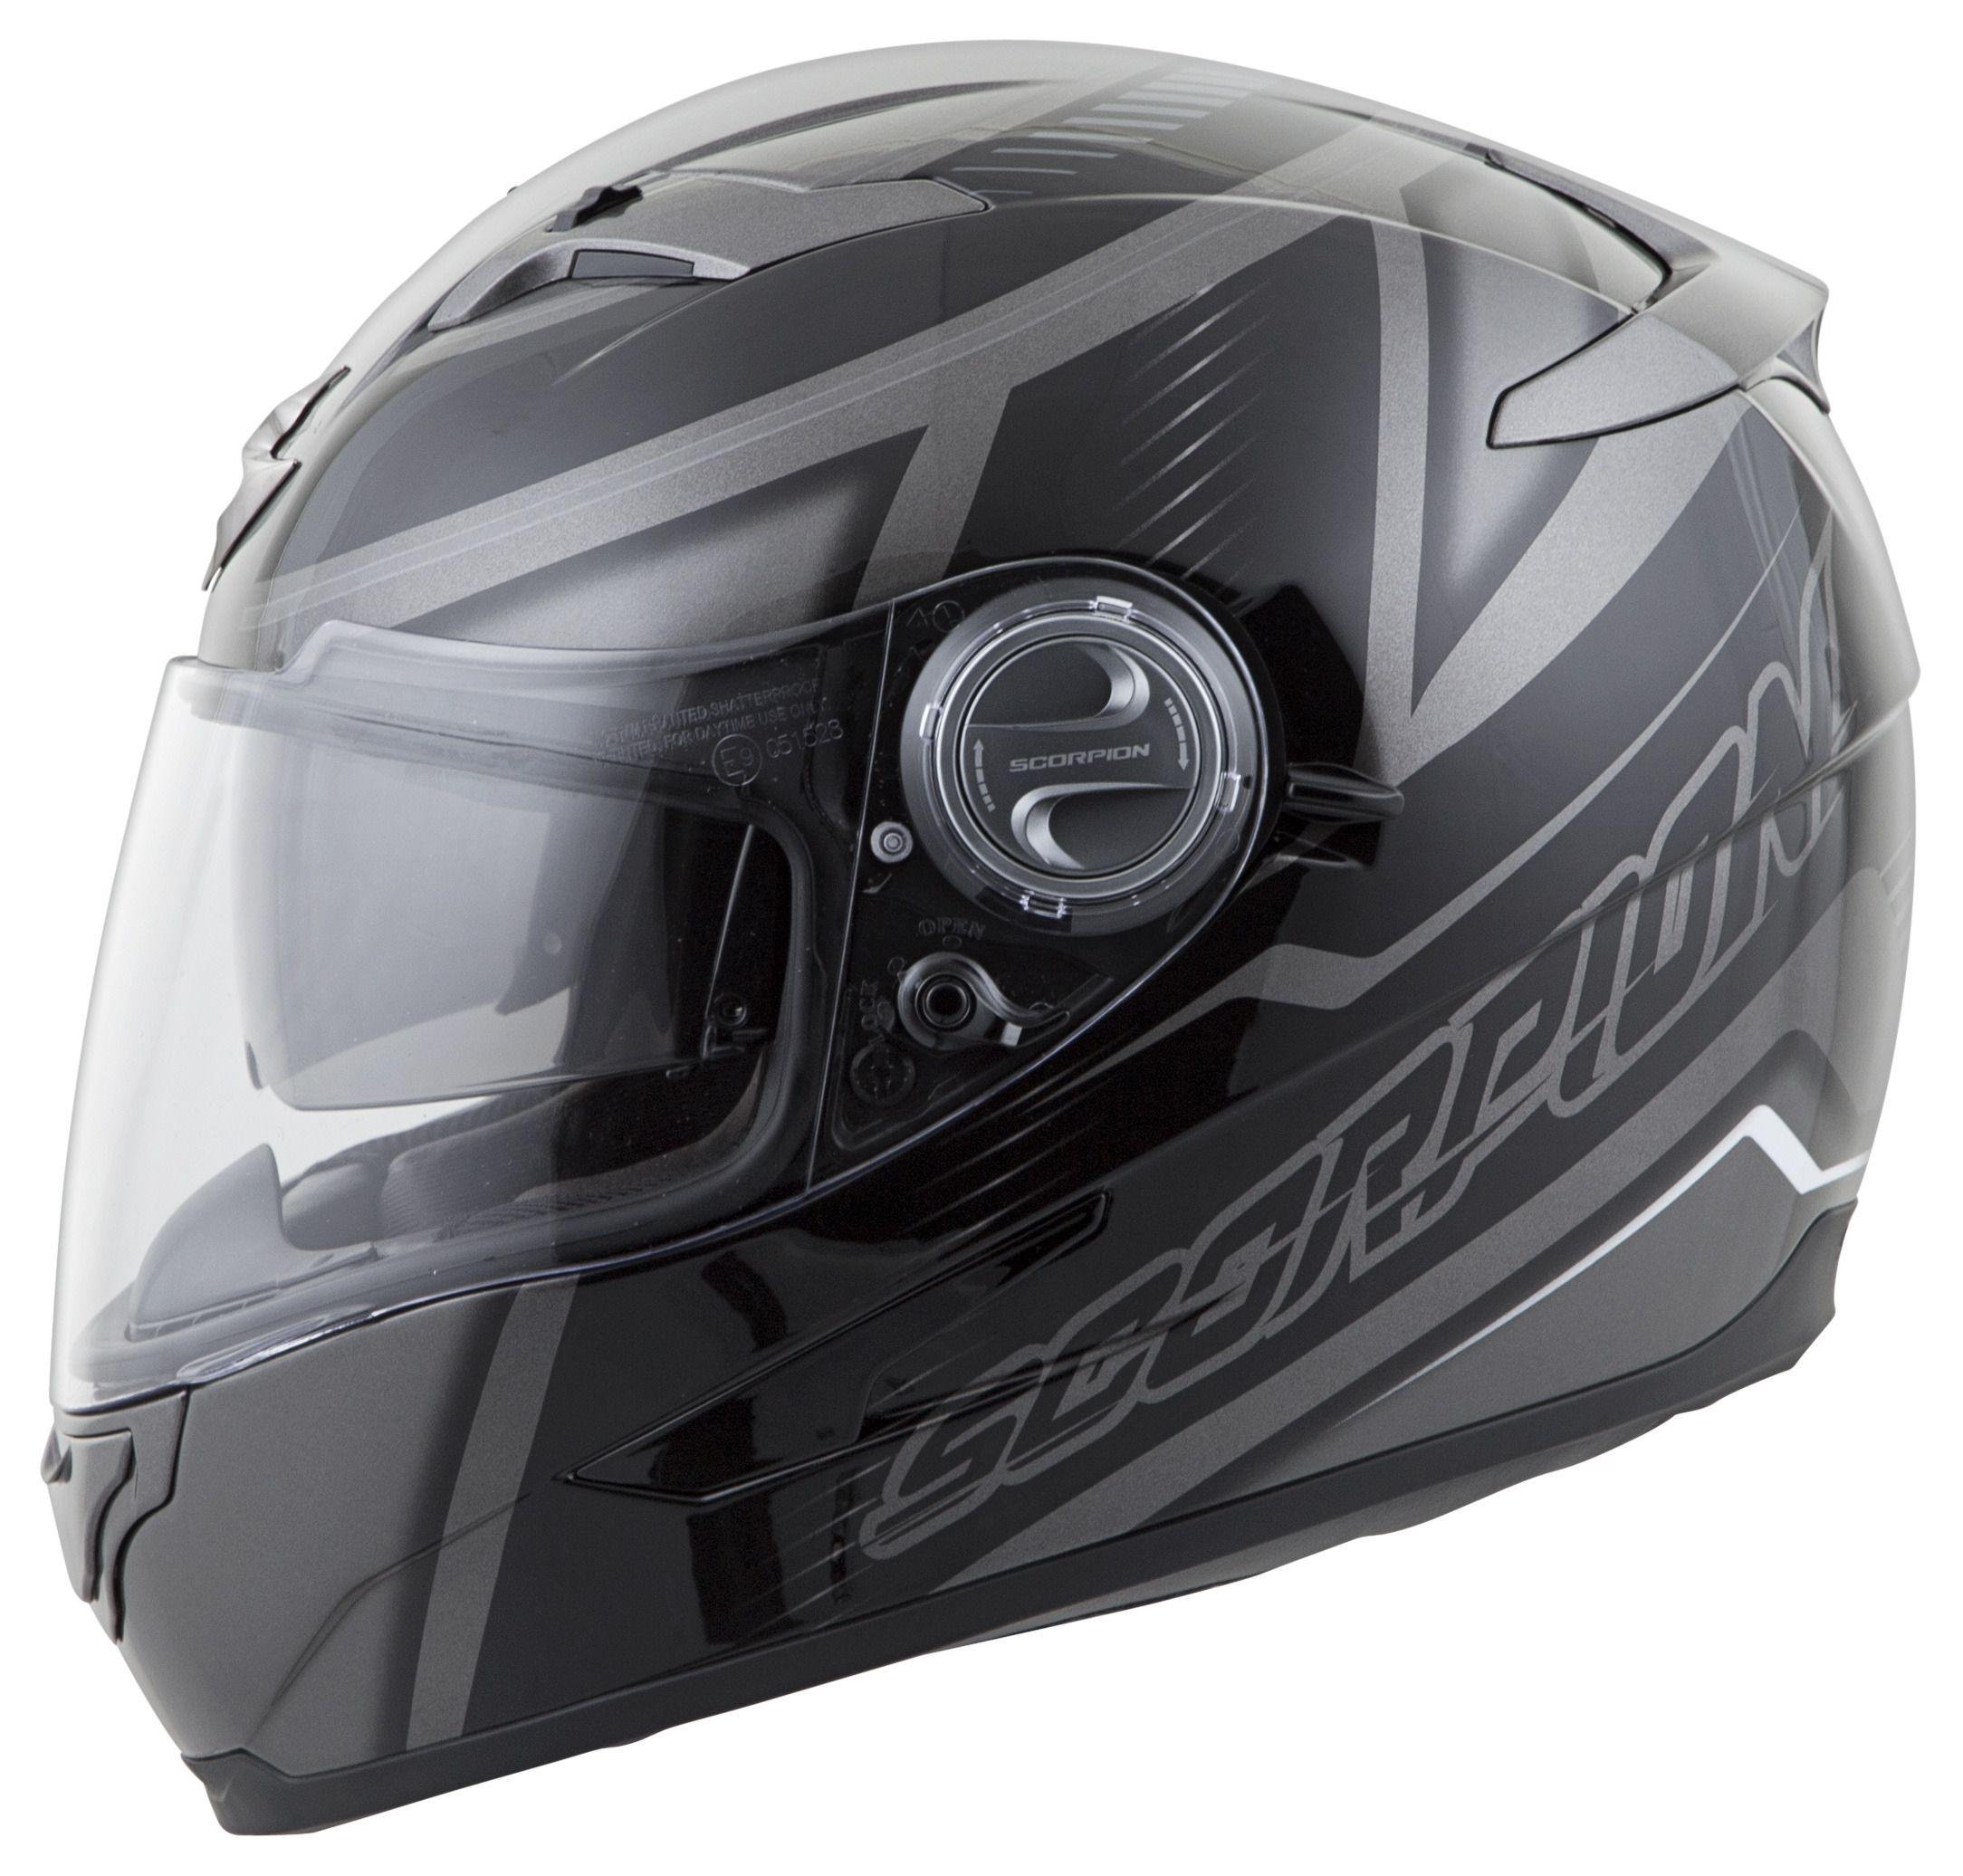 scorpion exo 500 corsica helmet revzilla. Black Bedroom Furniture Sets. Home Design Ideas